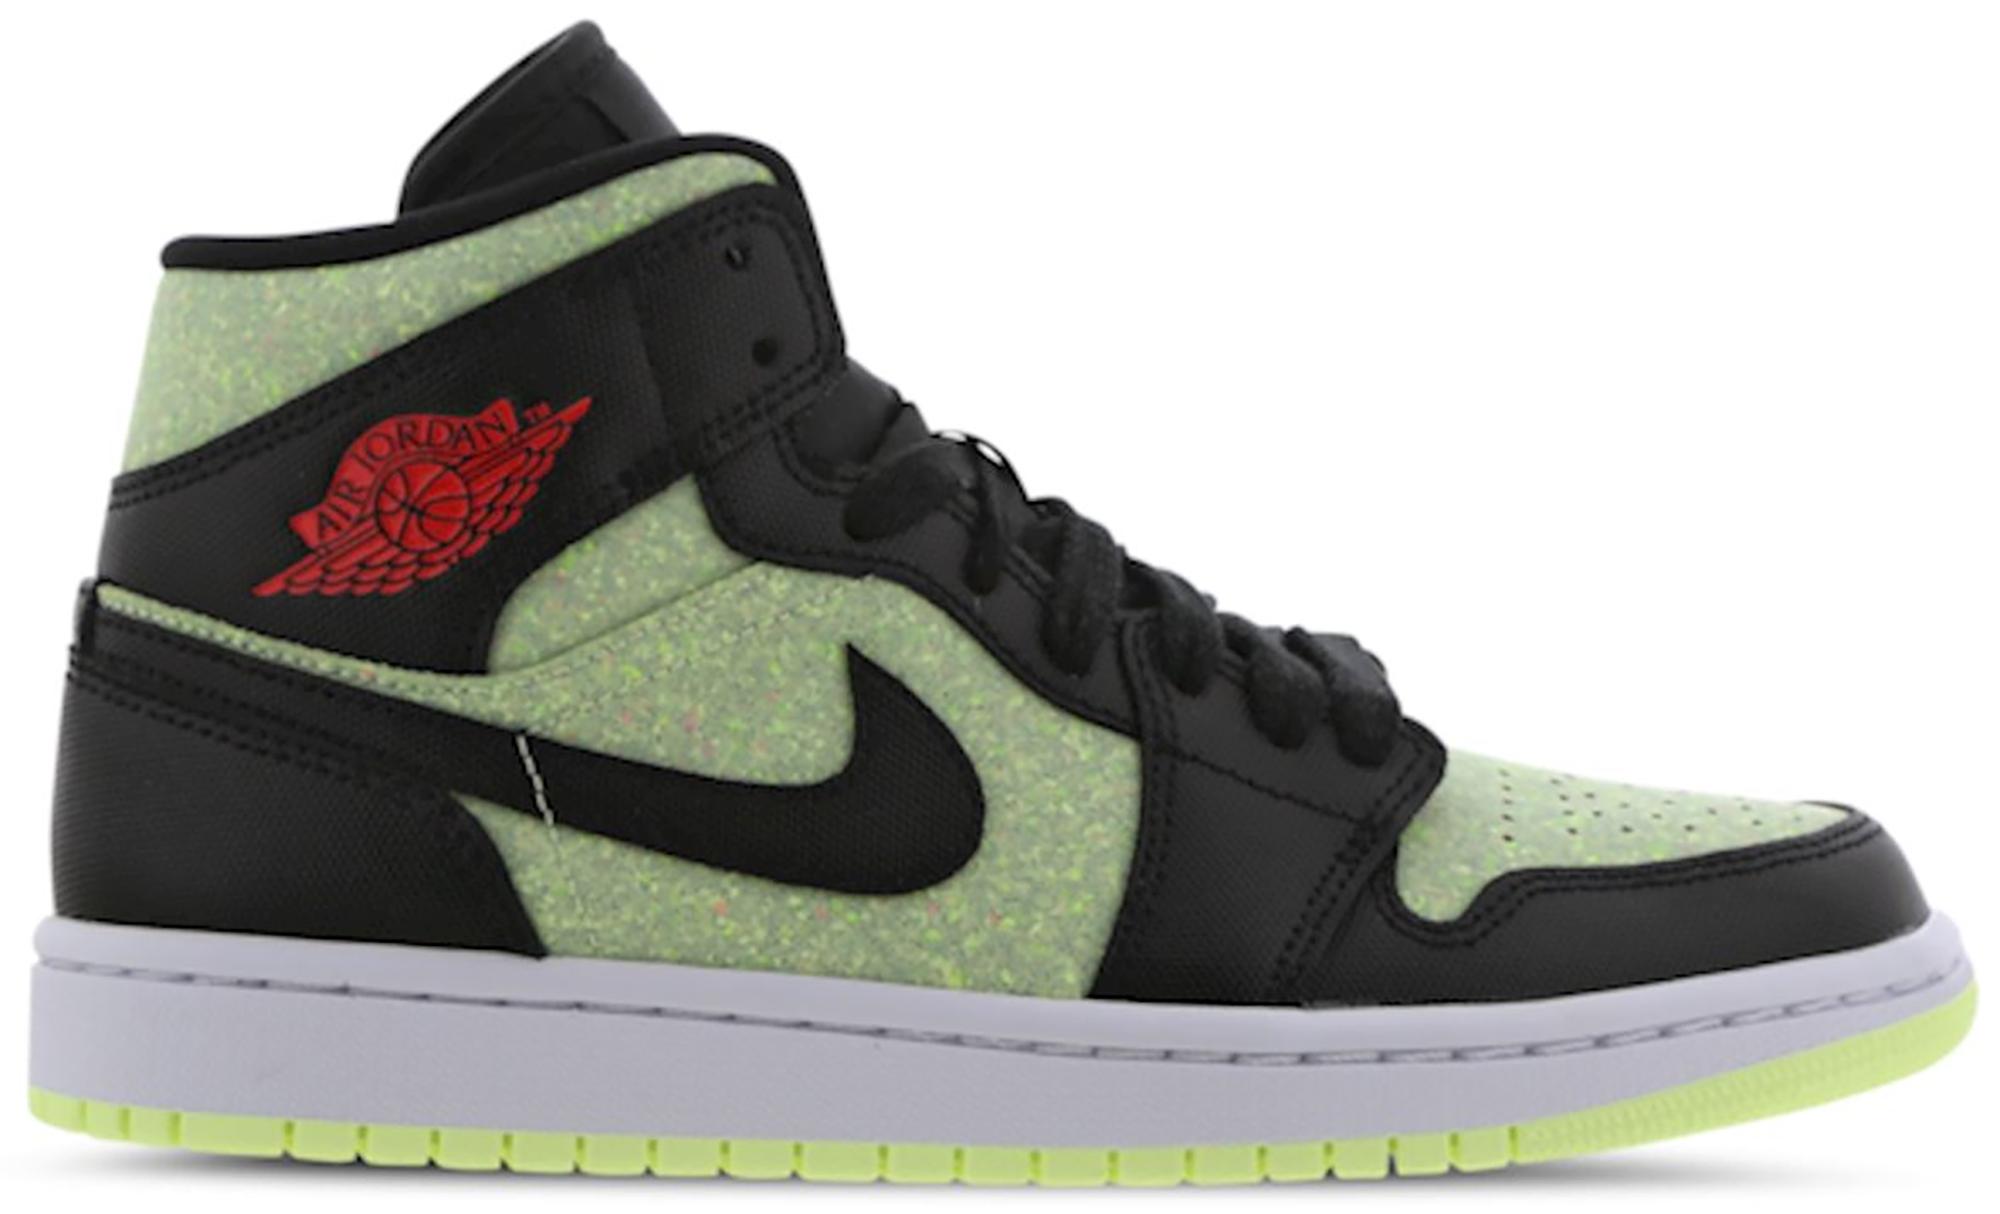 Jordan 1 Mid Nike Grind (W) - CV5276-003